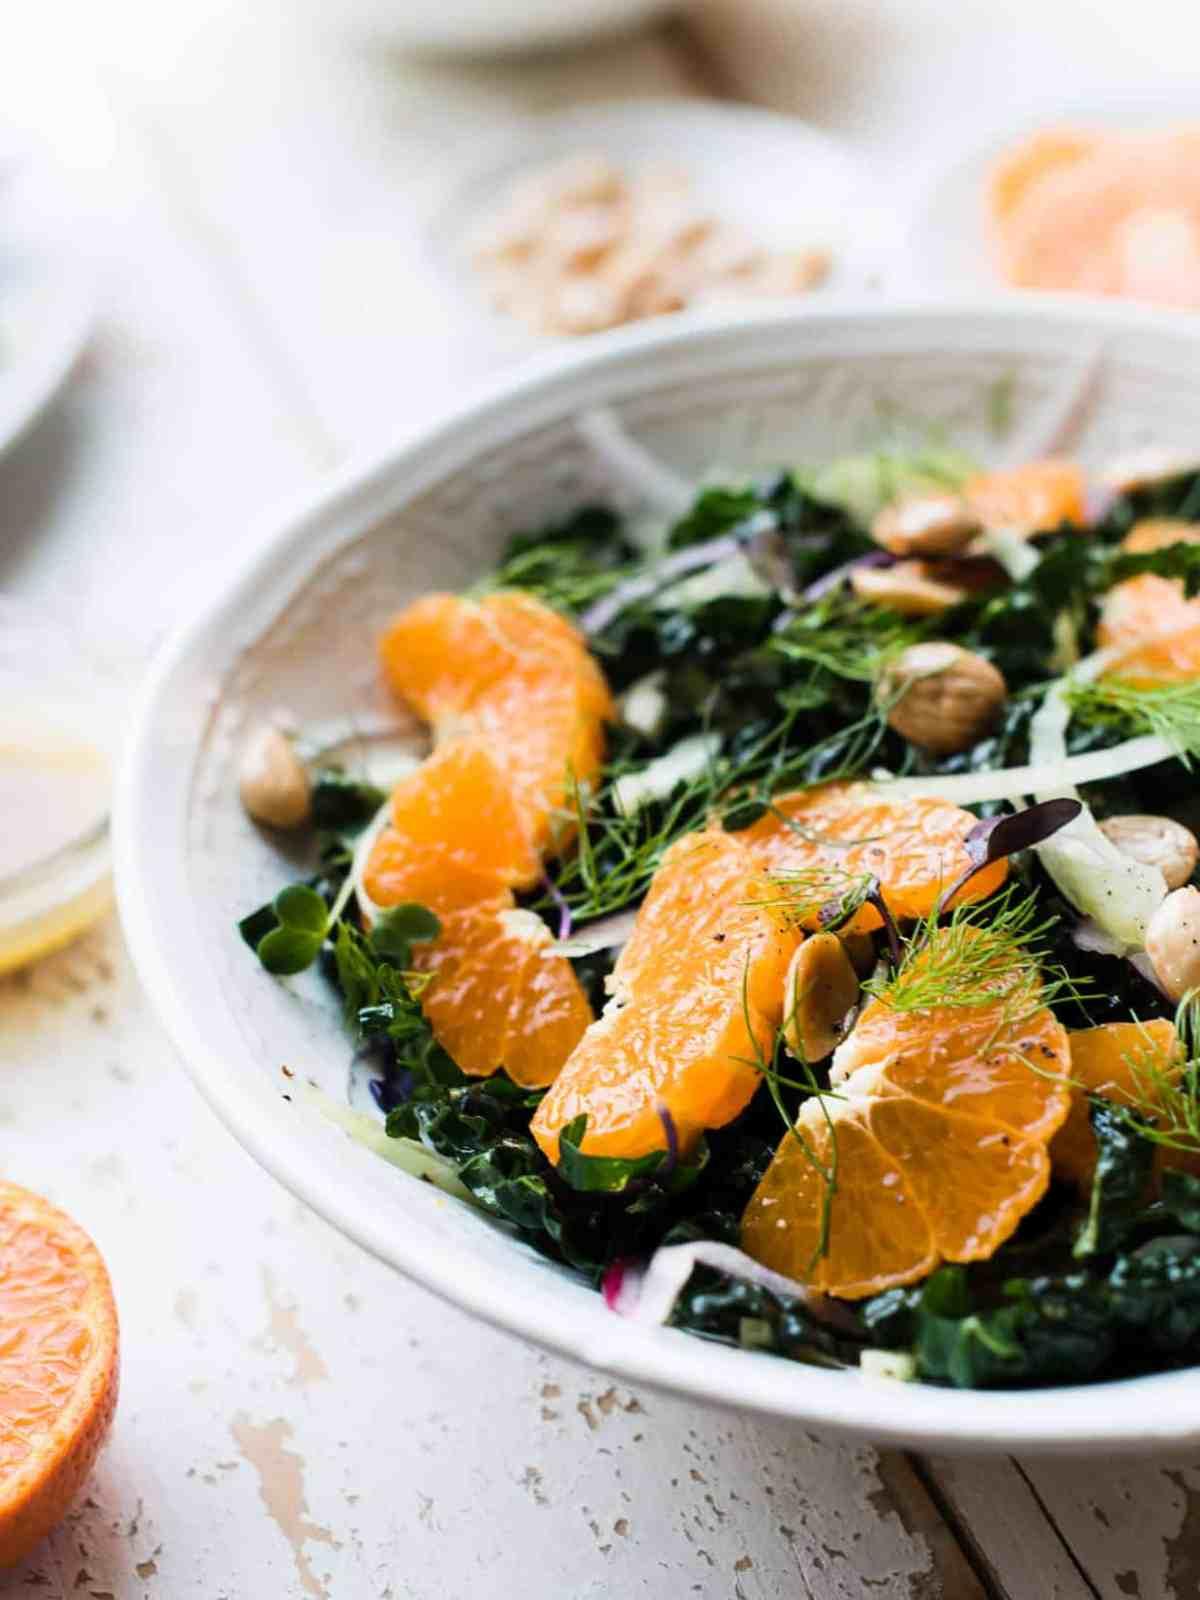 Juicy mandarin orange slices top kale salad in white bowl